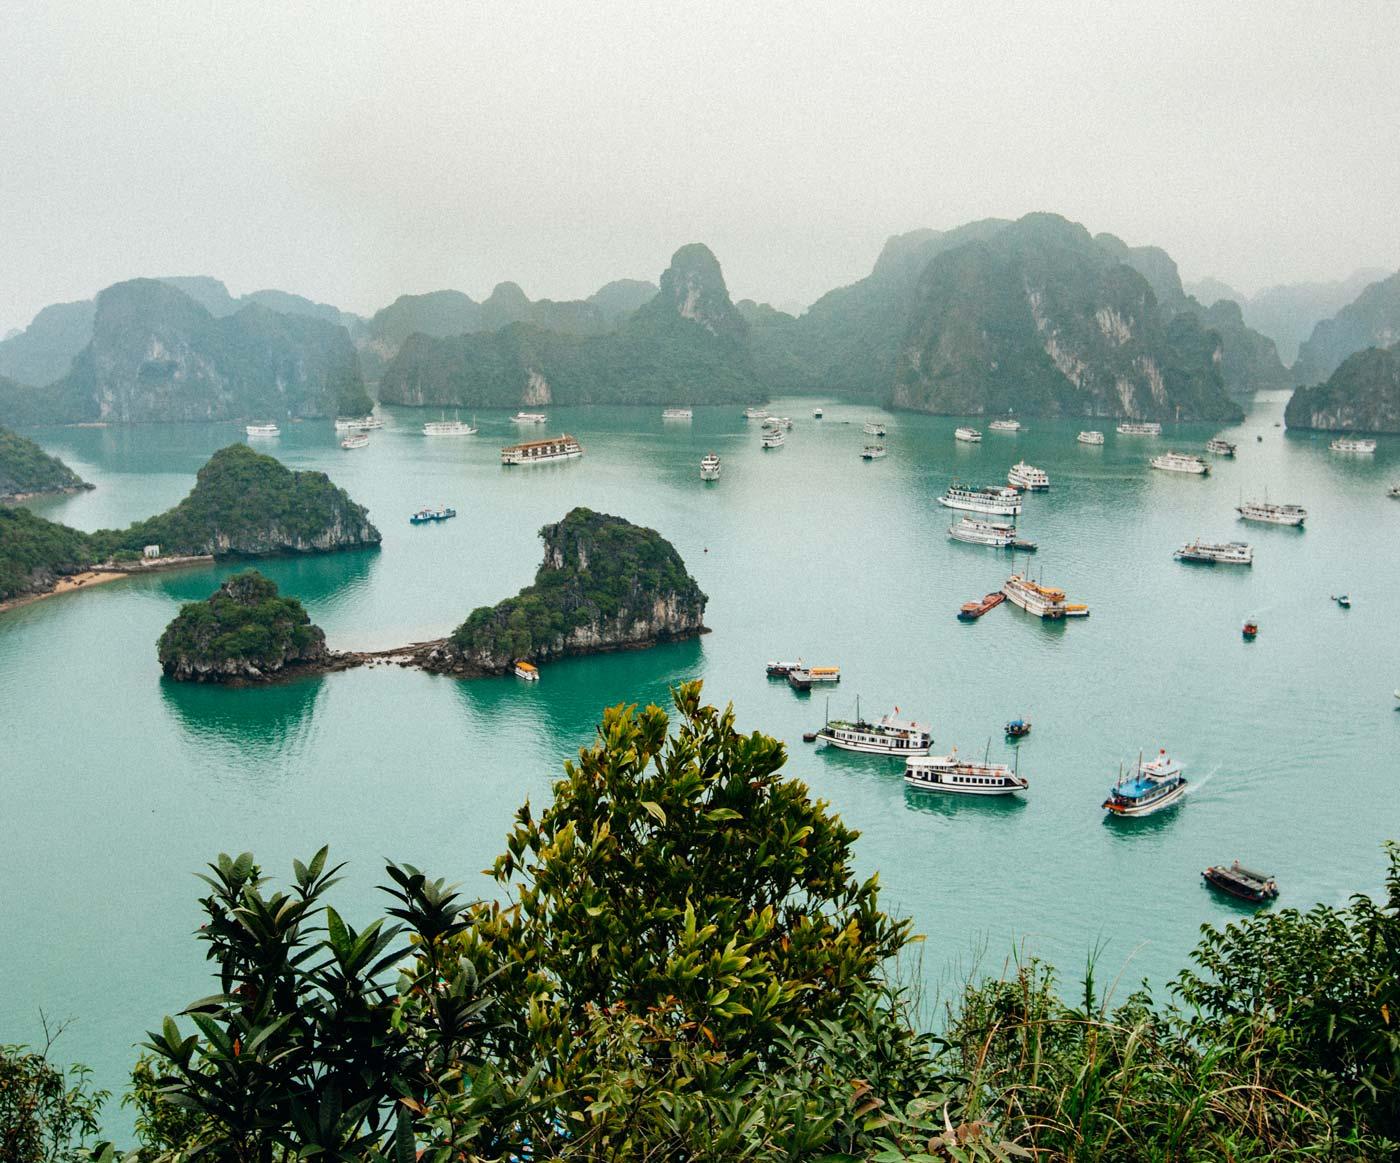 titop-mountain-lookout-vietnam